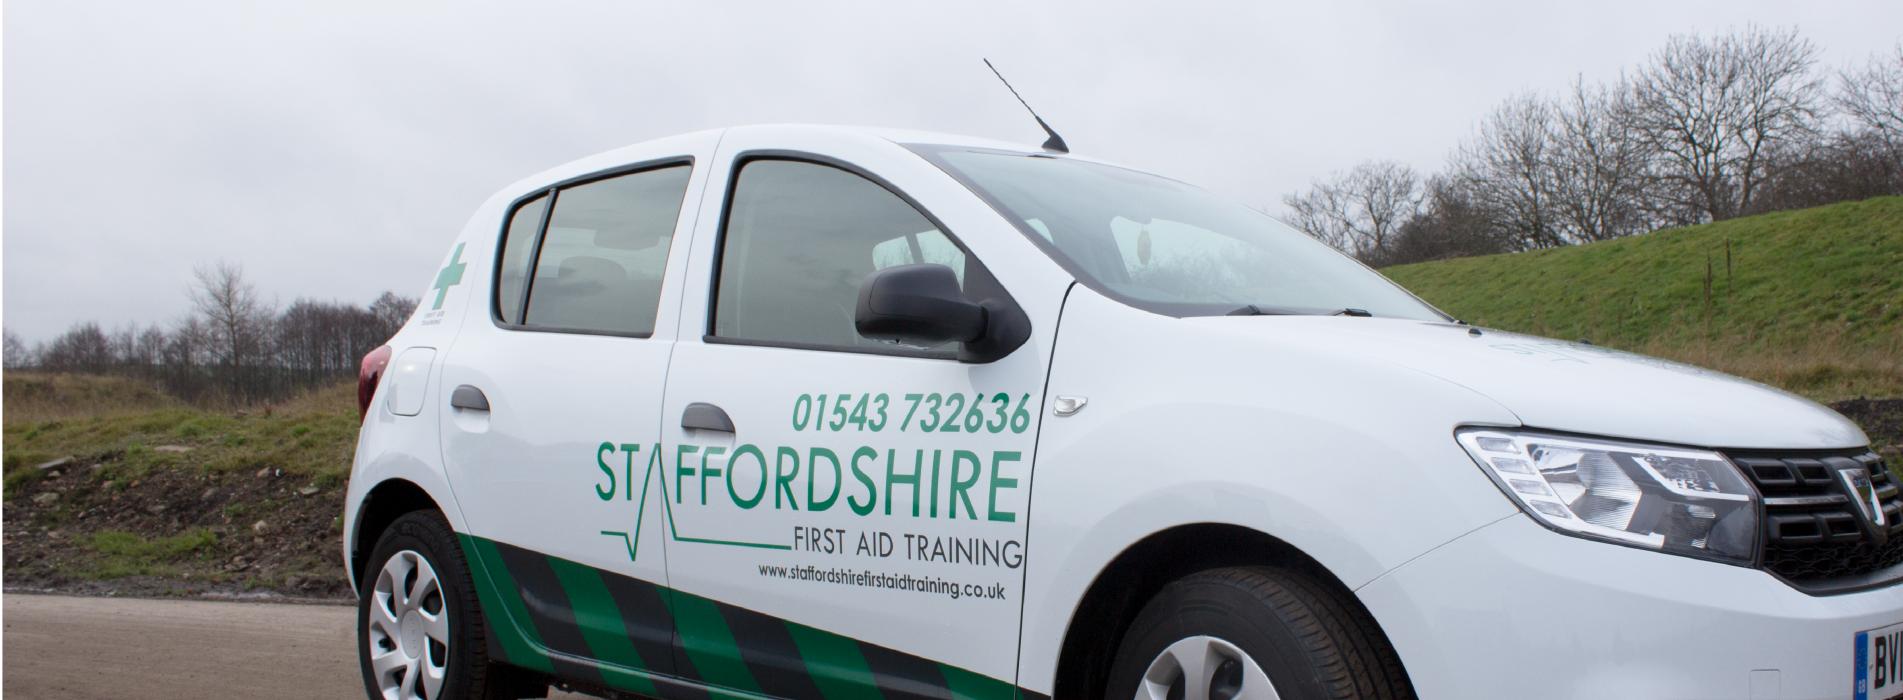 Marston Green first aid training